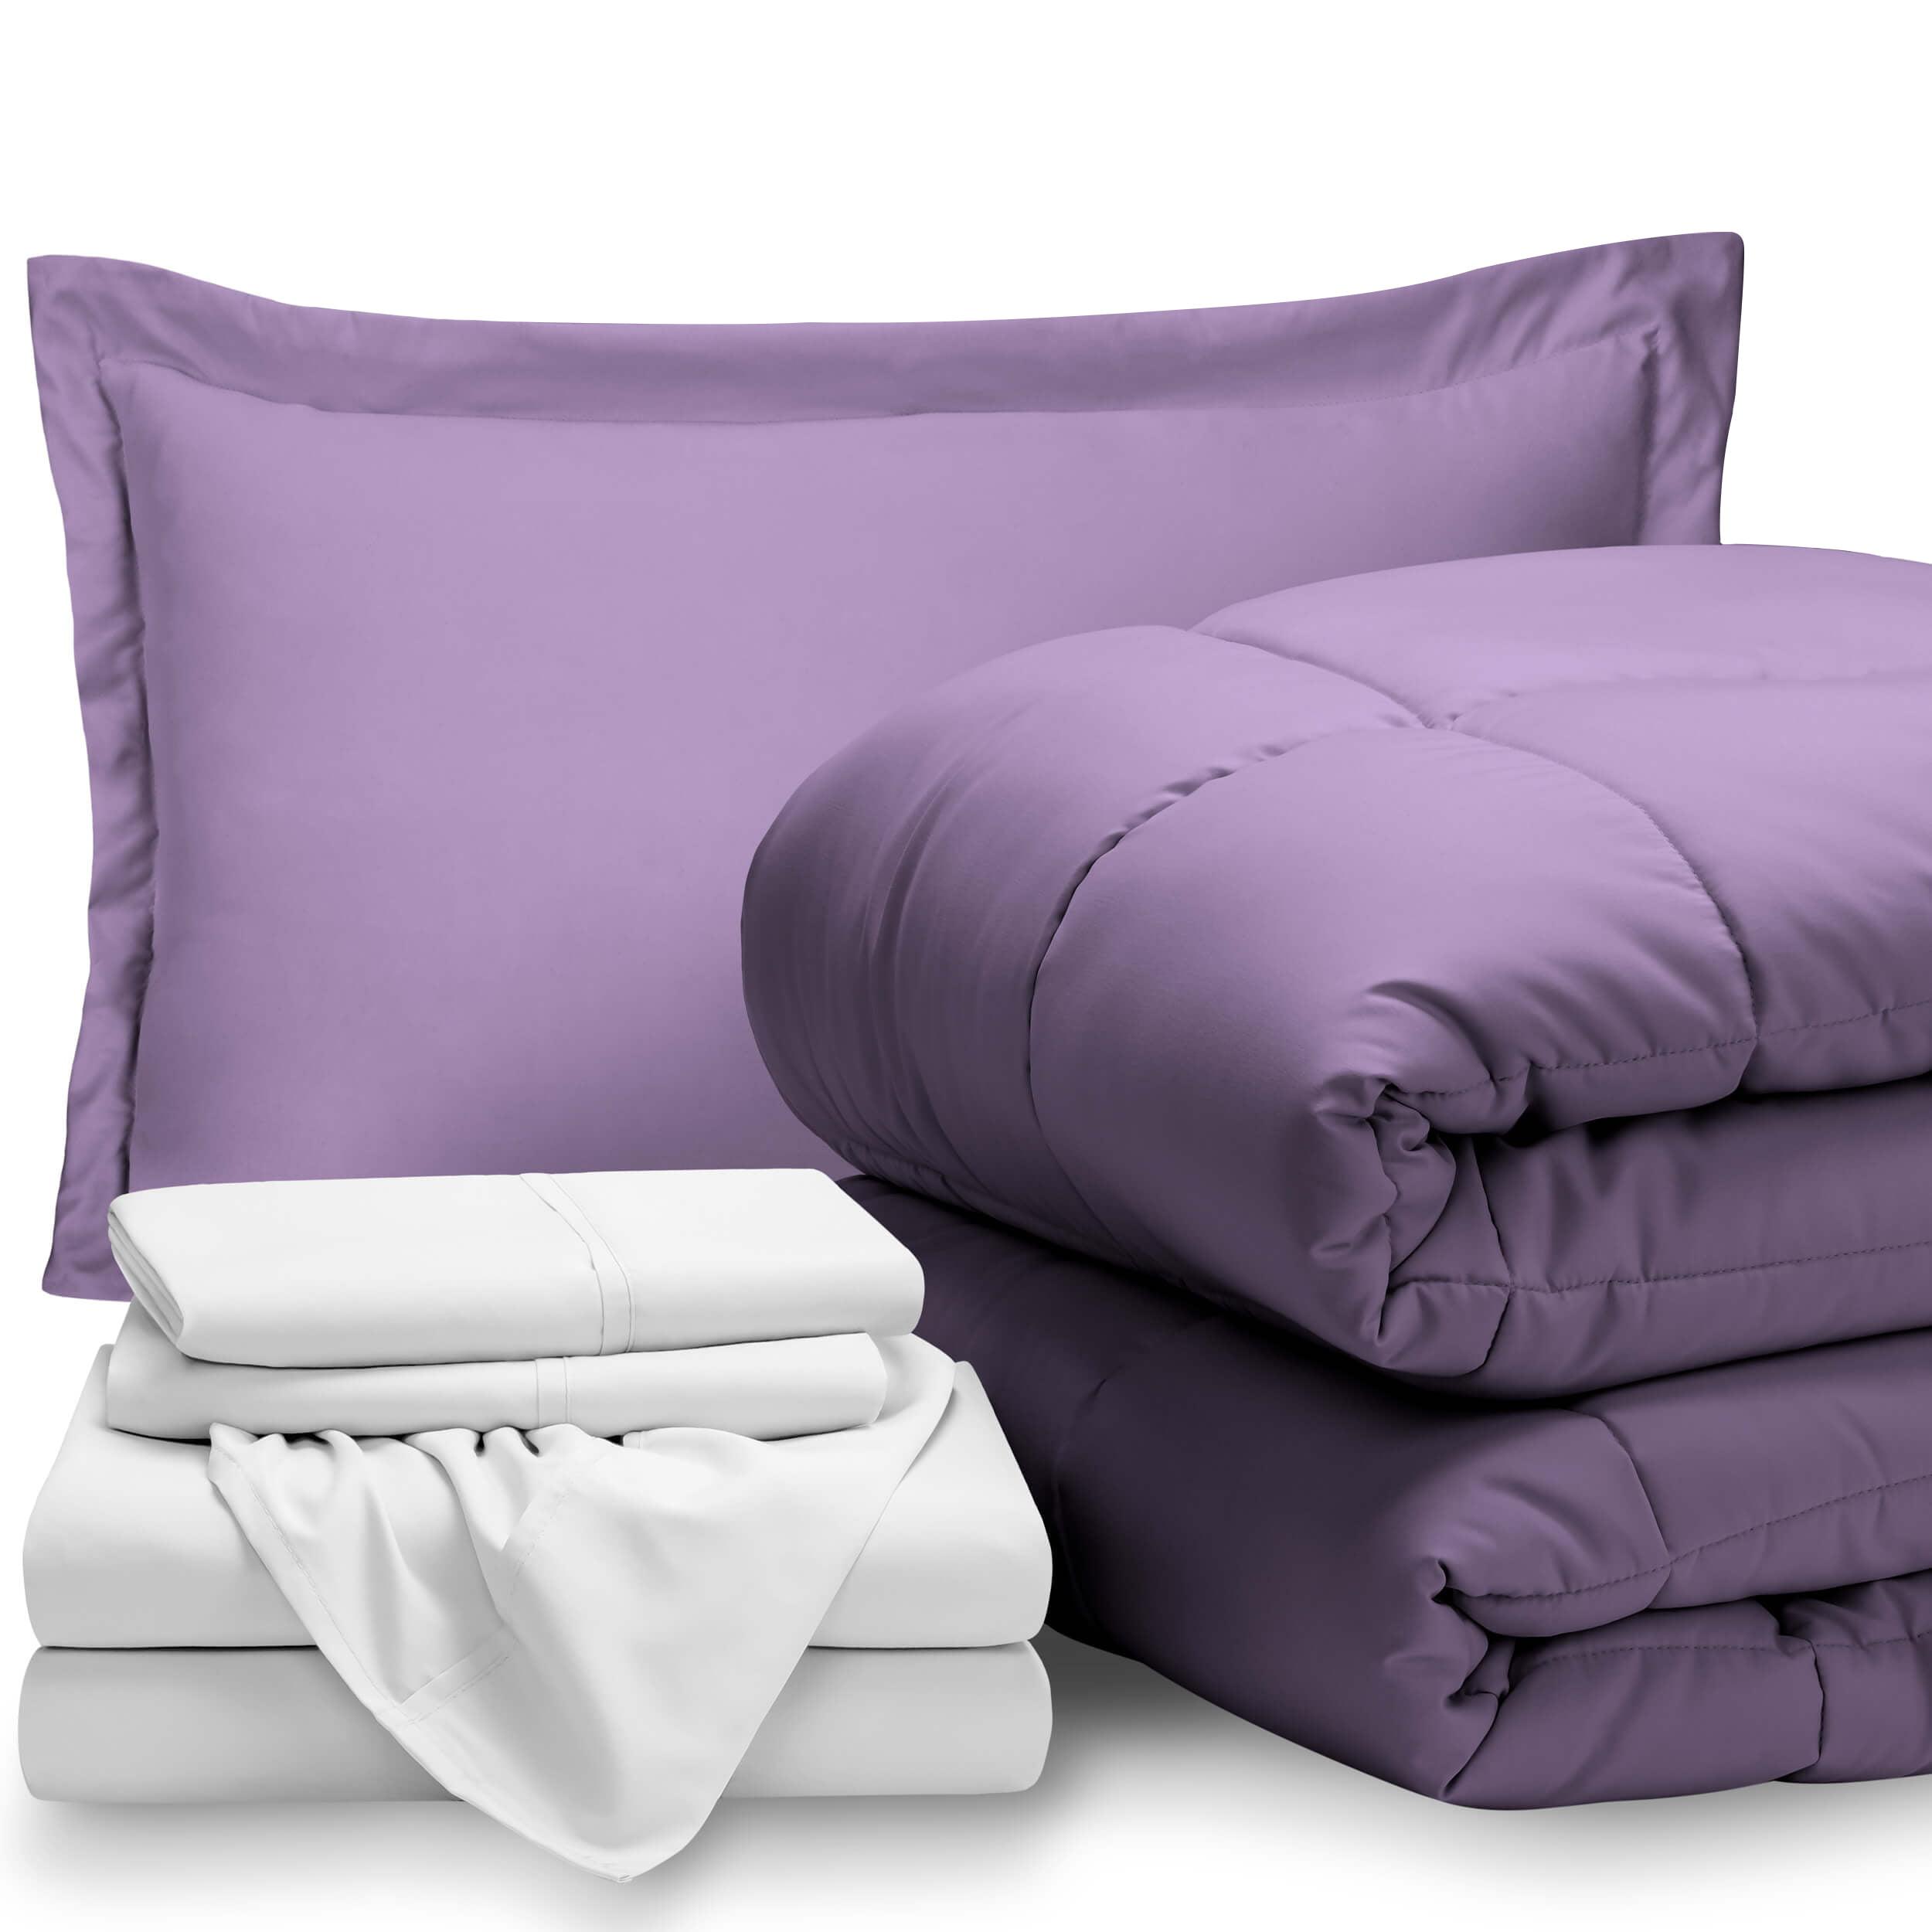 Bare Home 5 Piece Bed In A Bag Twin Xl Comforter Set Lavender Sheet Set White Walmart Com Walmart Com